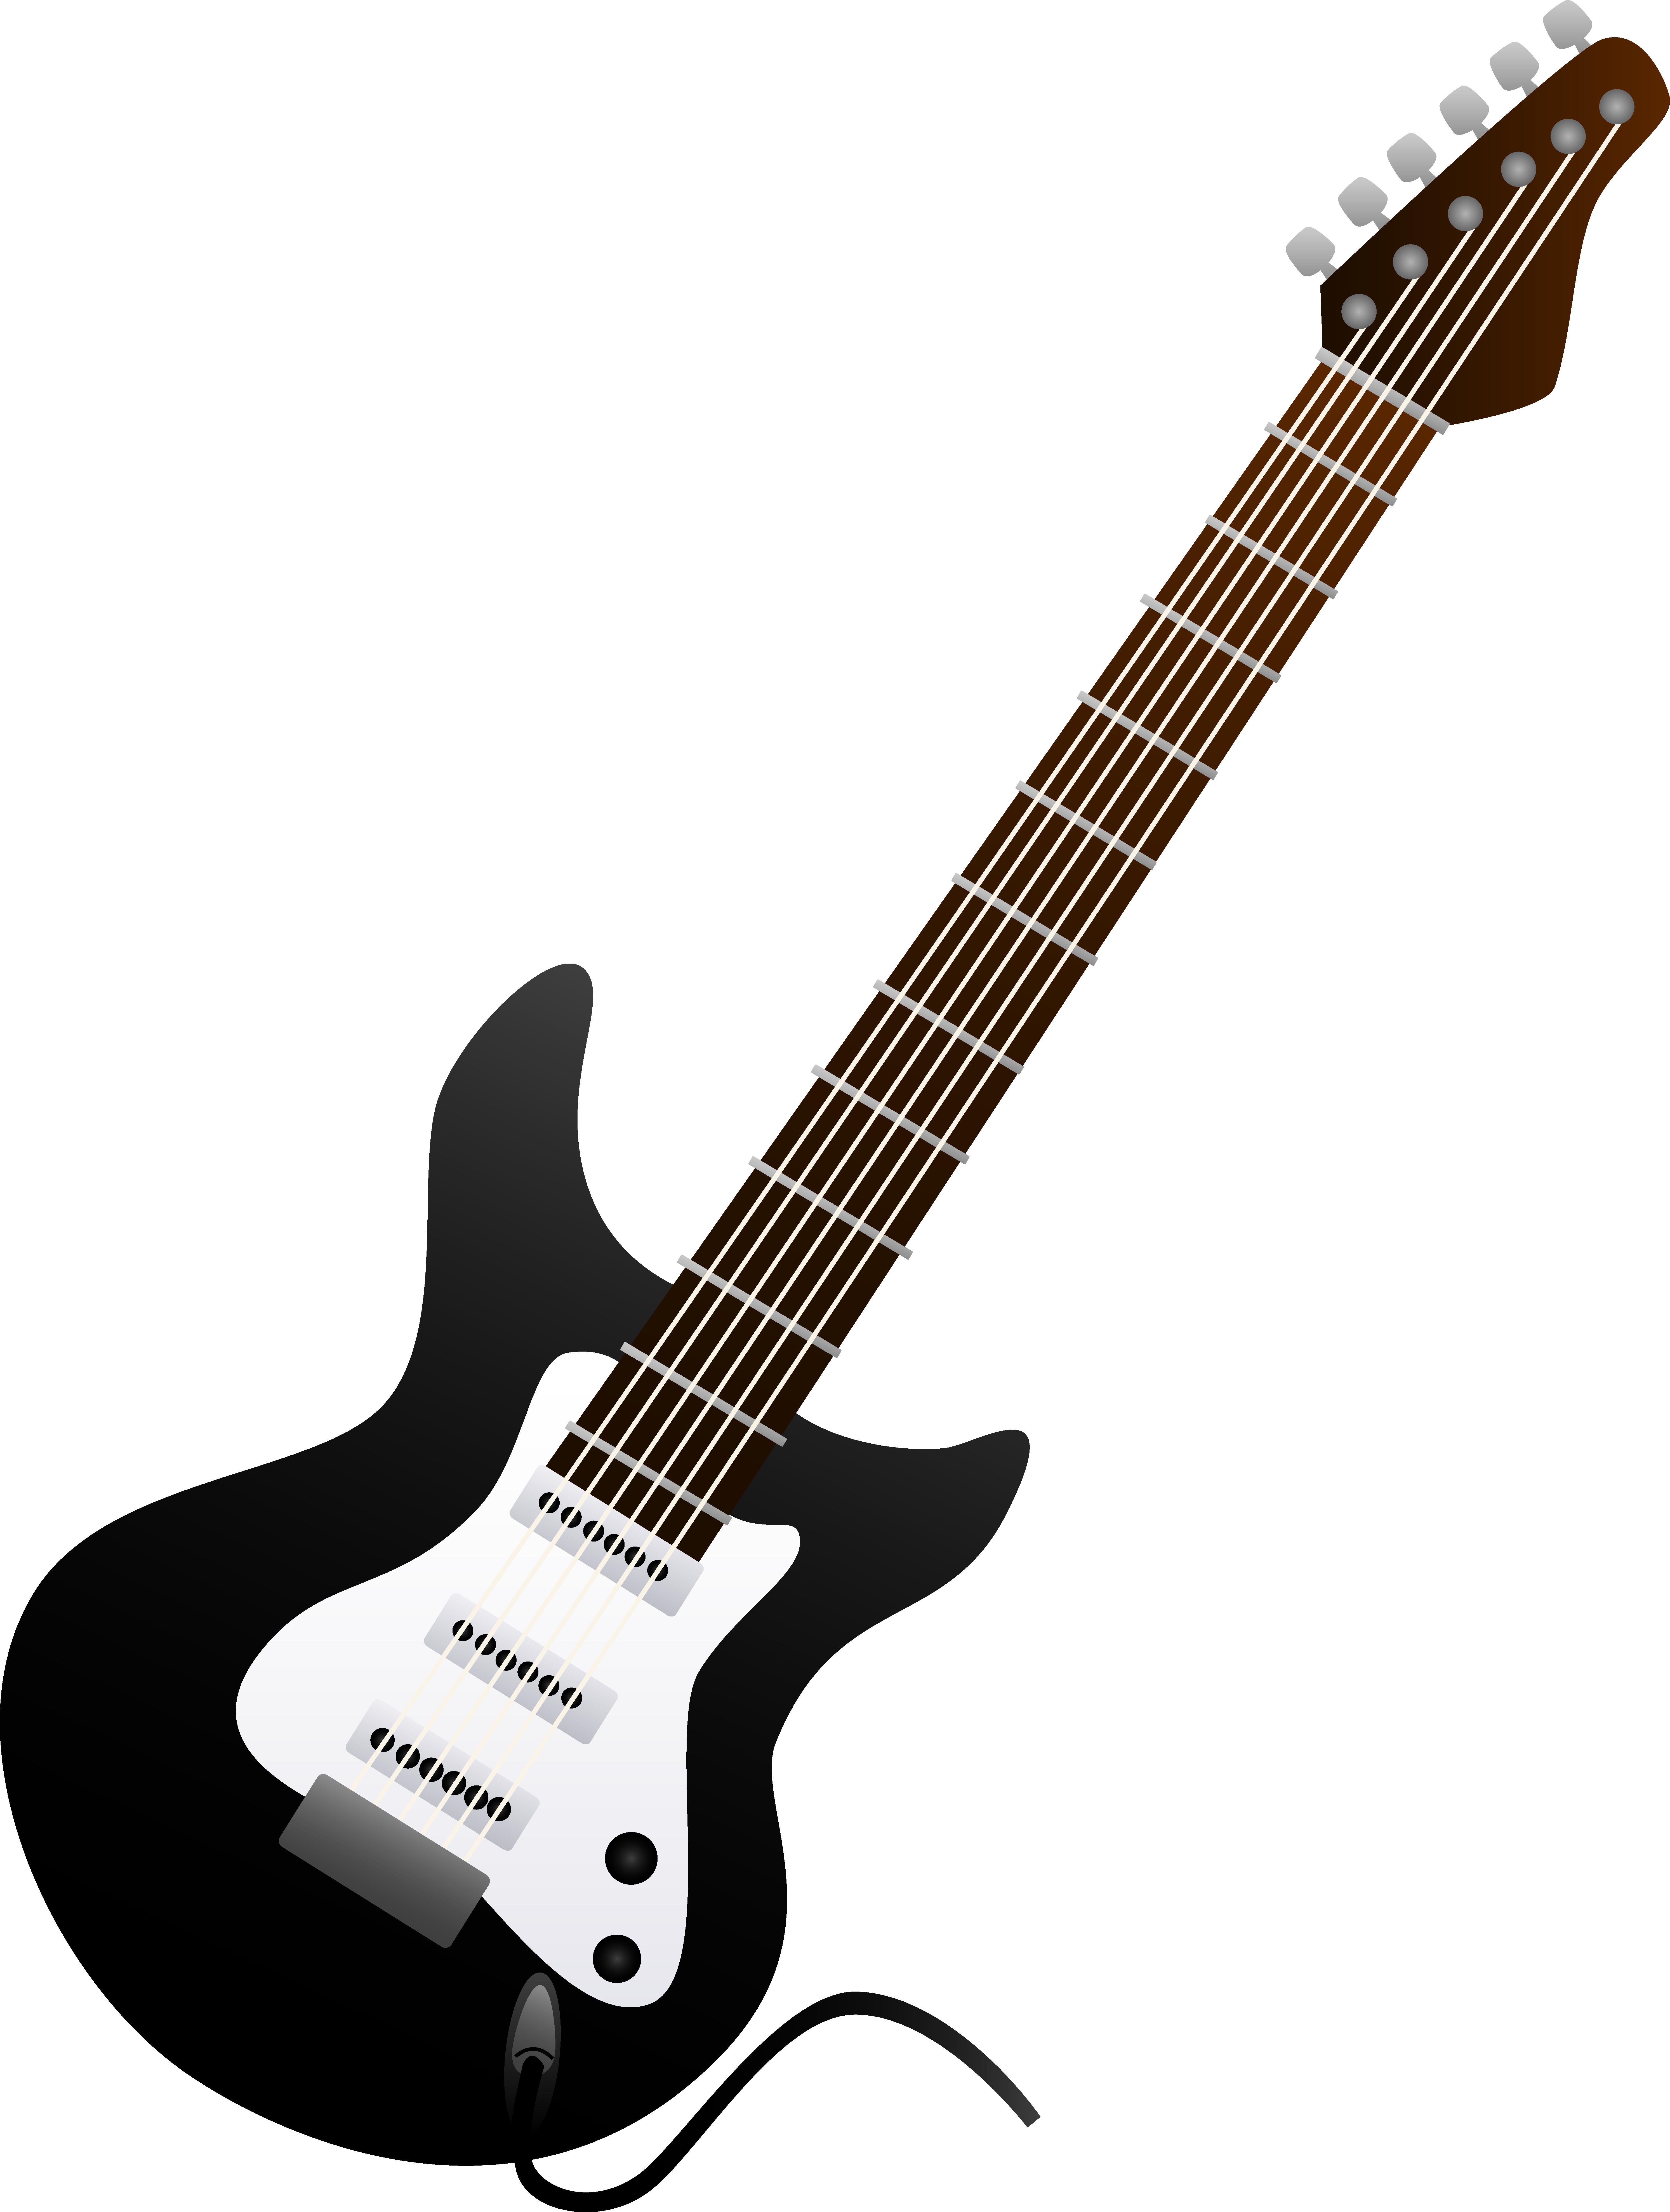 clipart free library Acoustic clipart. Guitar clip art black